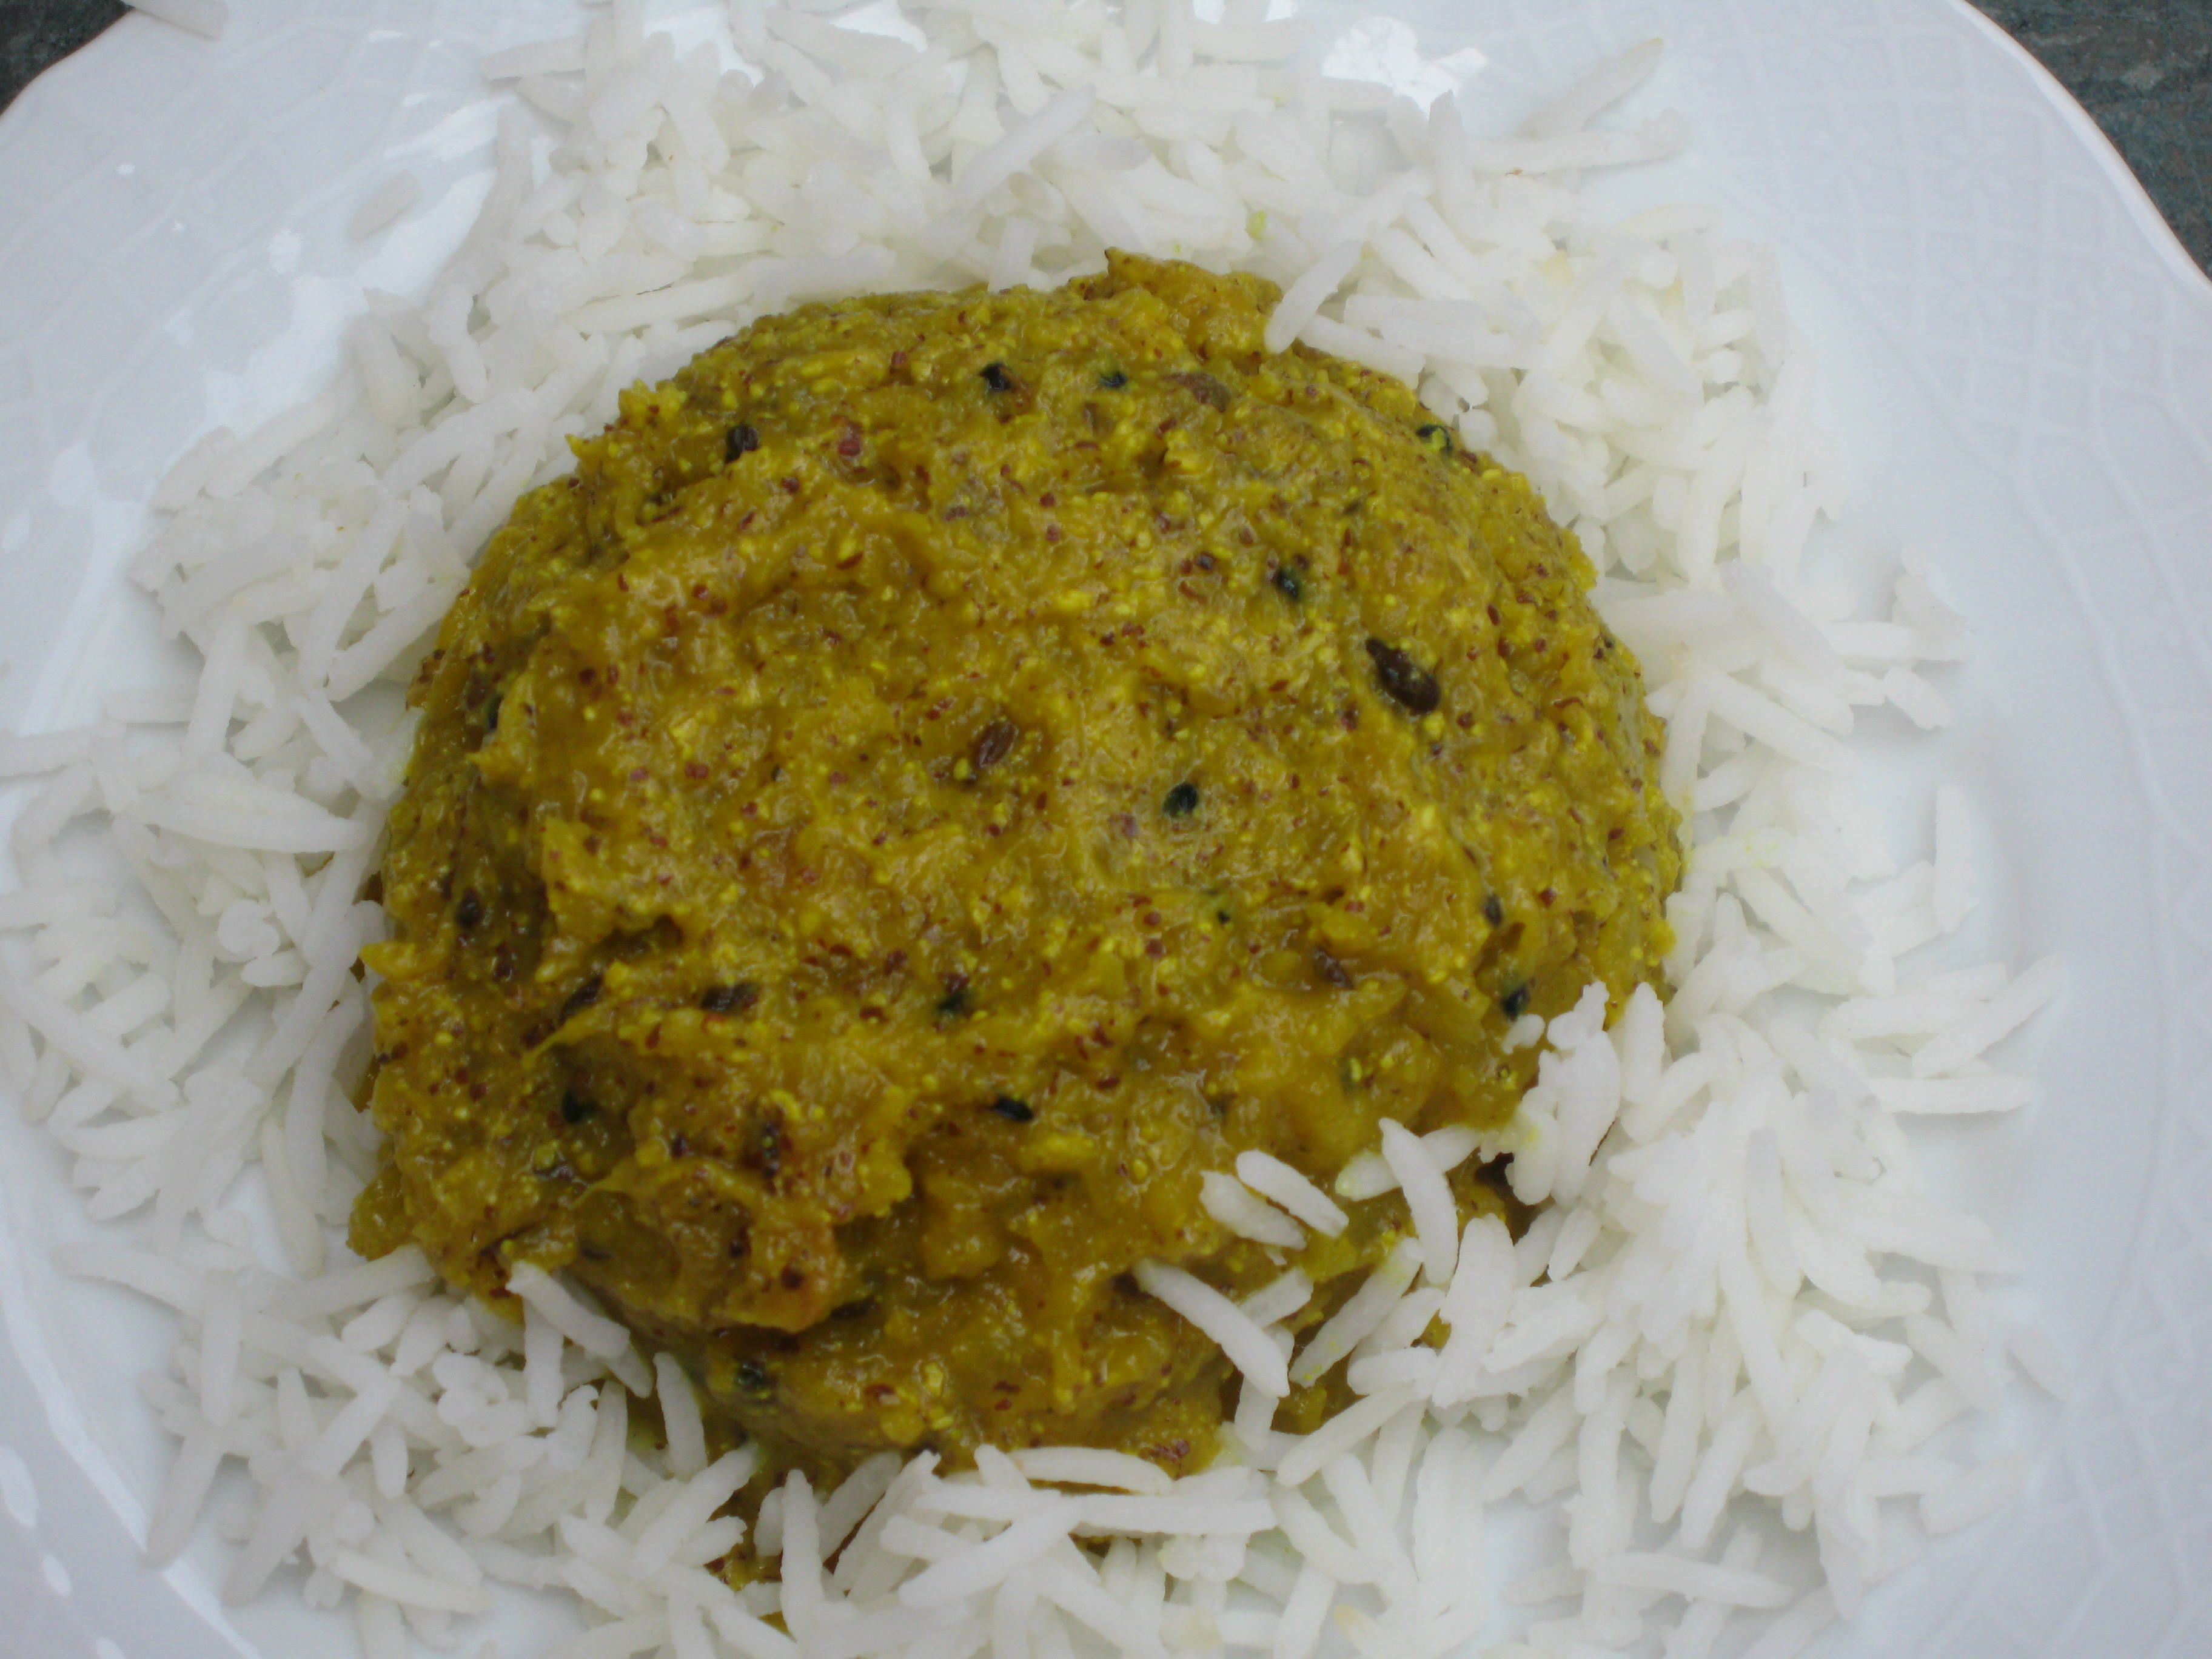 Indian pahari himachali recipes the restaurant fairys kitchen as forumfinder Choice Image